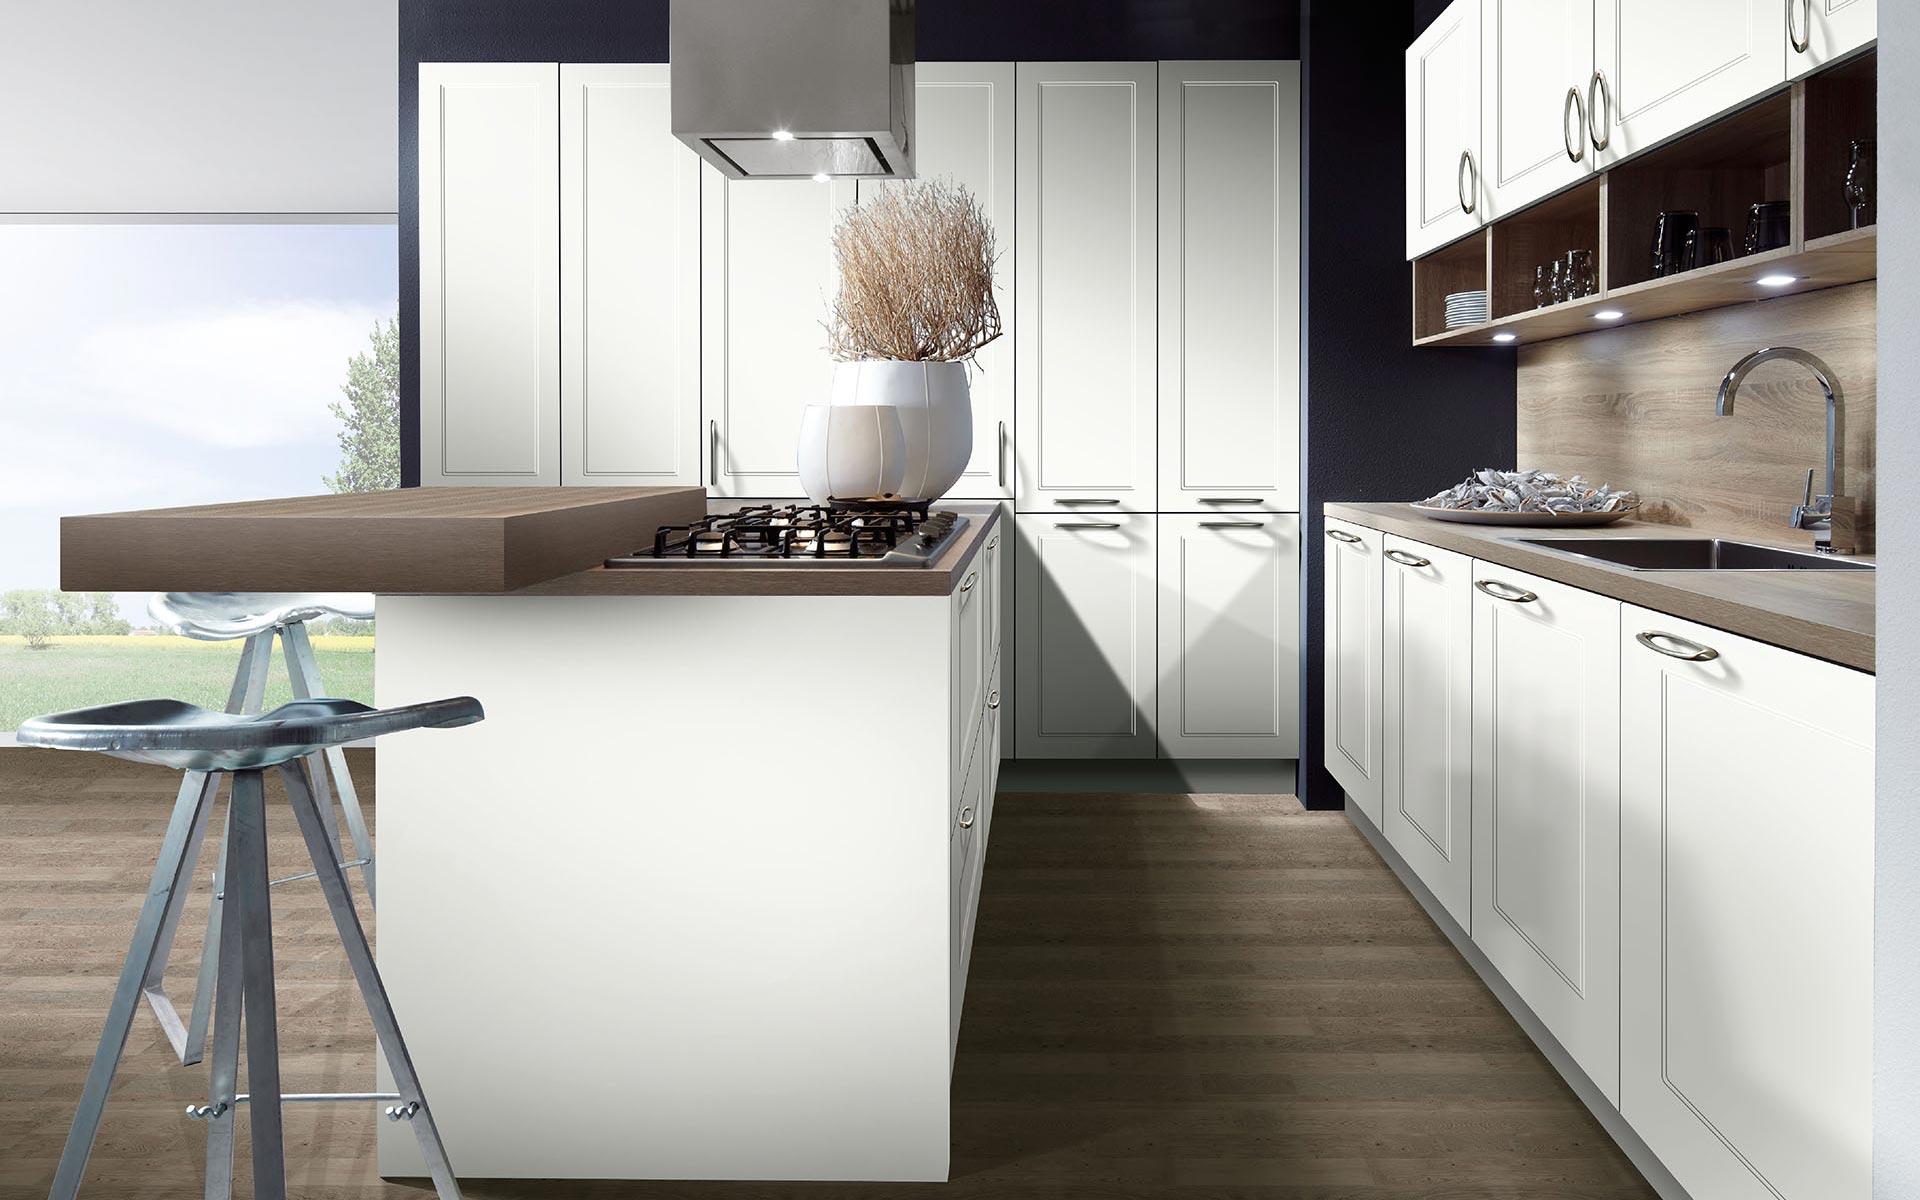 Toronto: Kitchens from Germany, Europe. Step Matt Snow